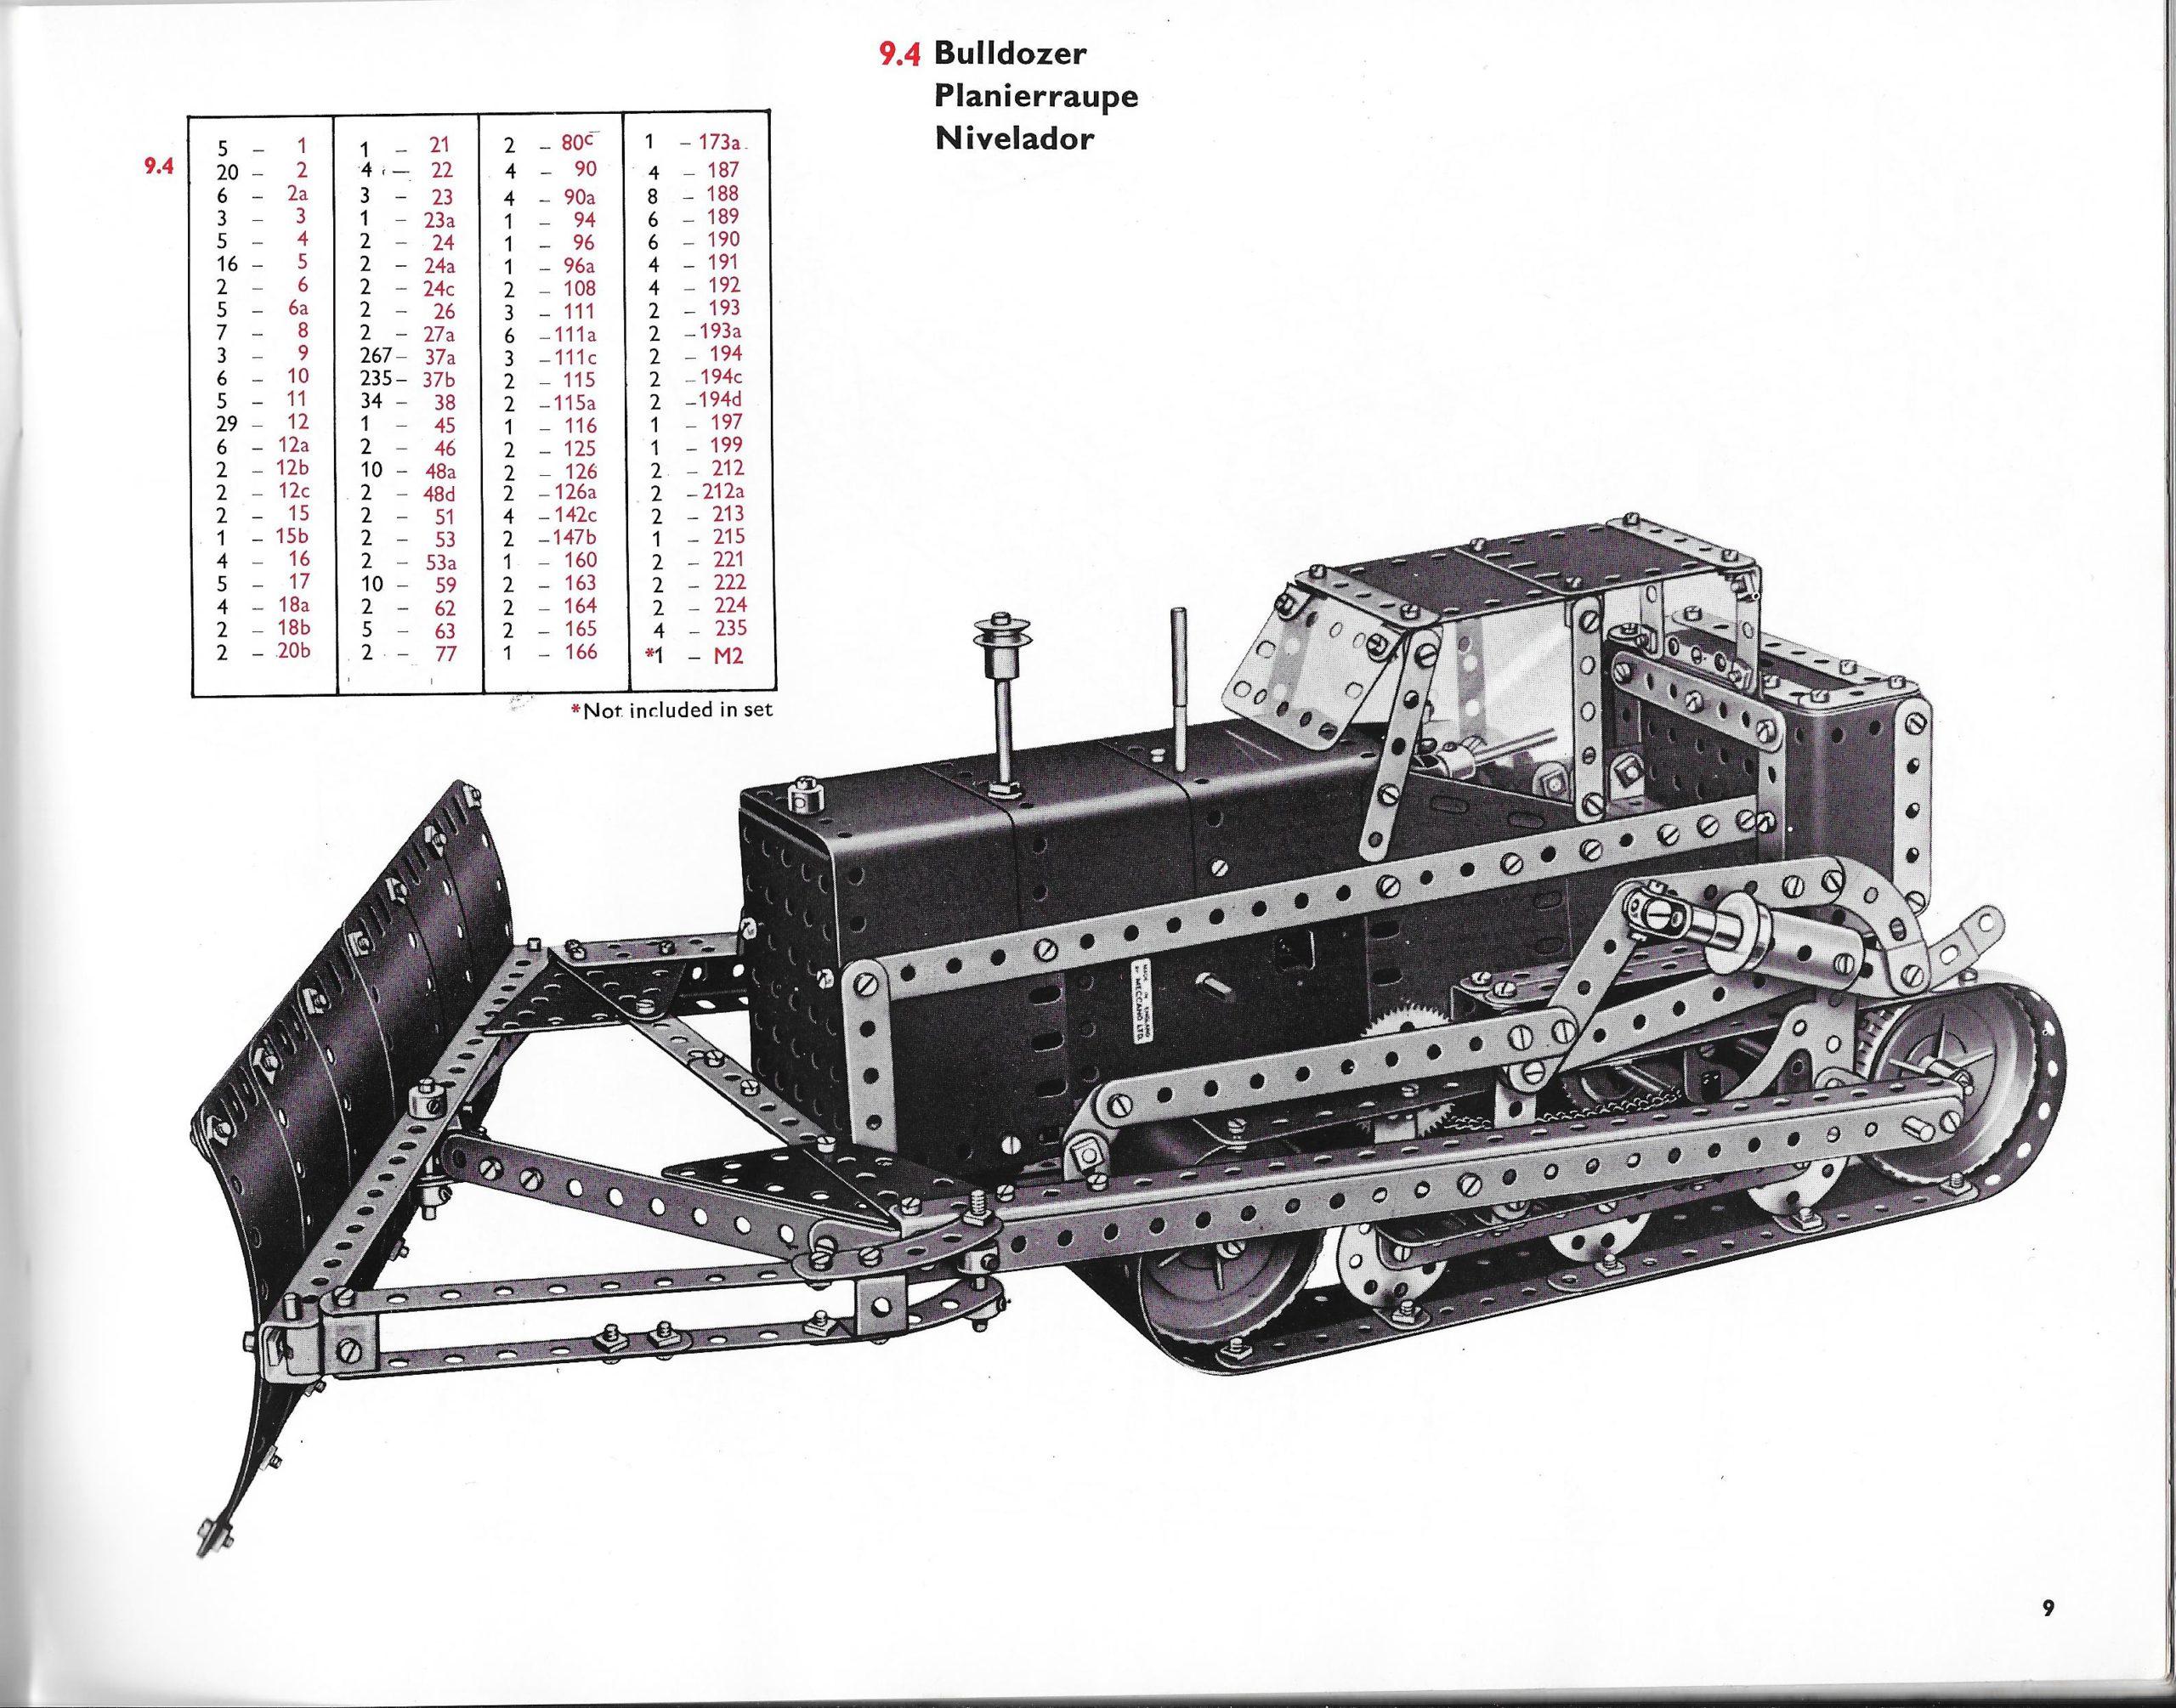 Bulldozer 9.4